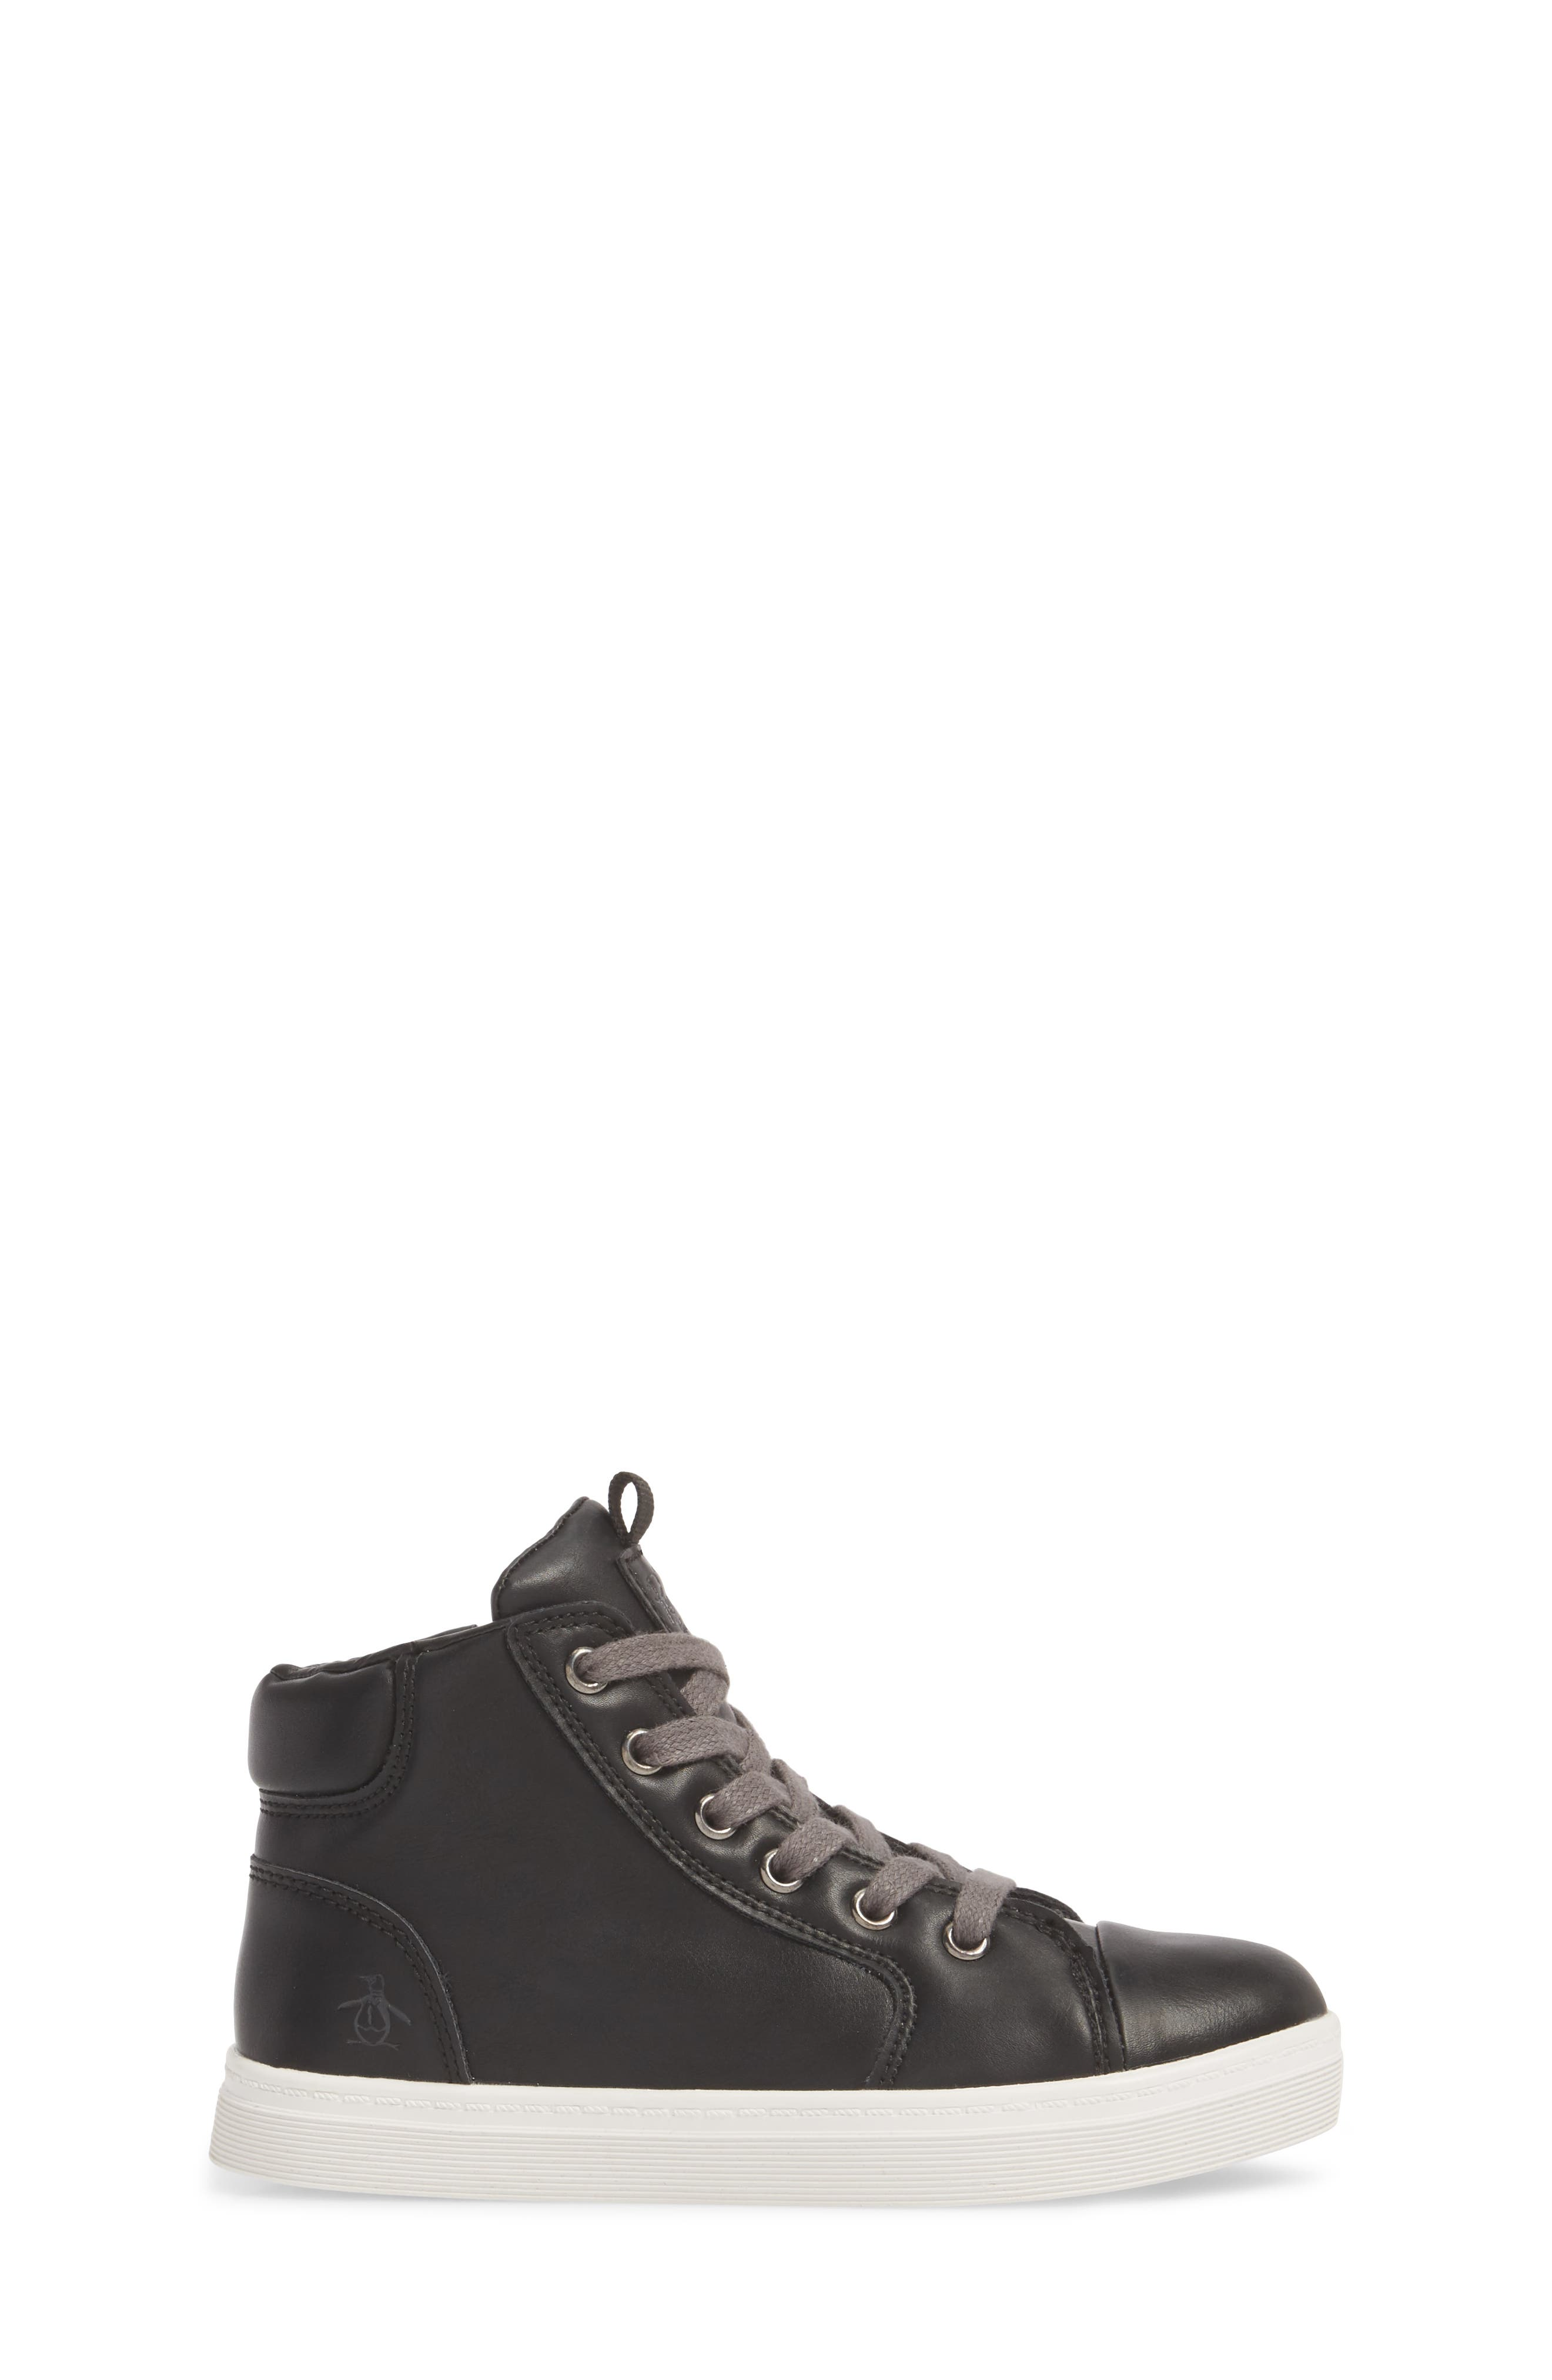 Carson High Top Sneaker,                             Alternate thumbnail 3, color,                             BLACK